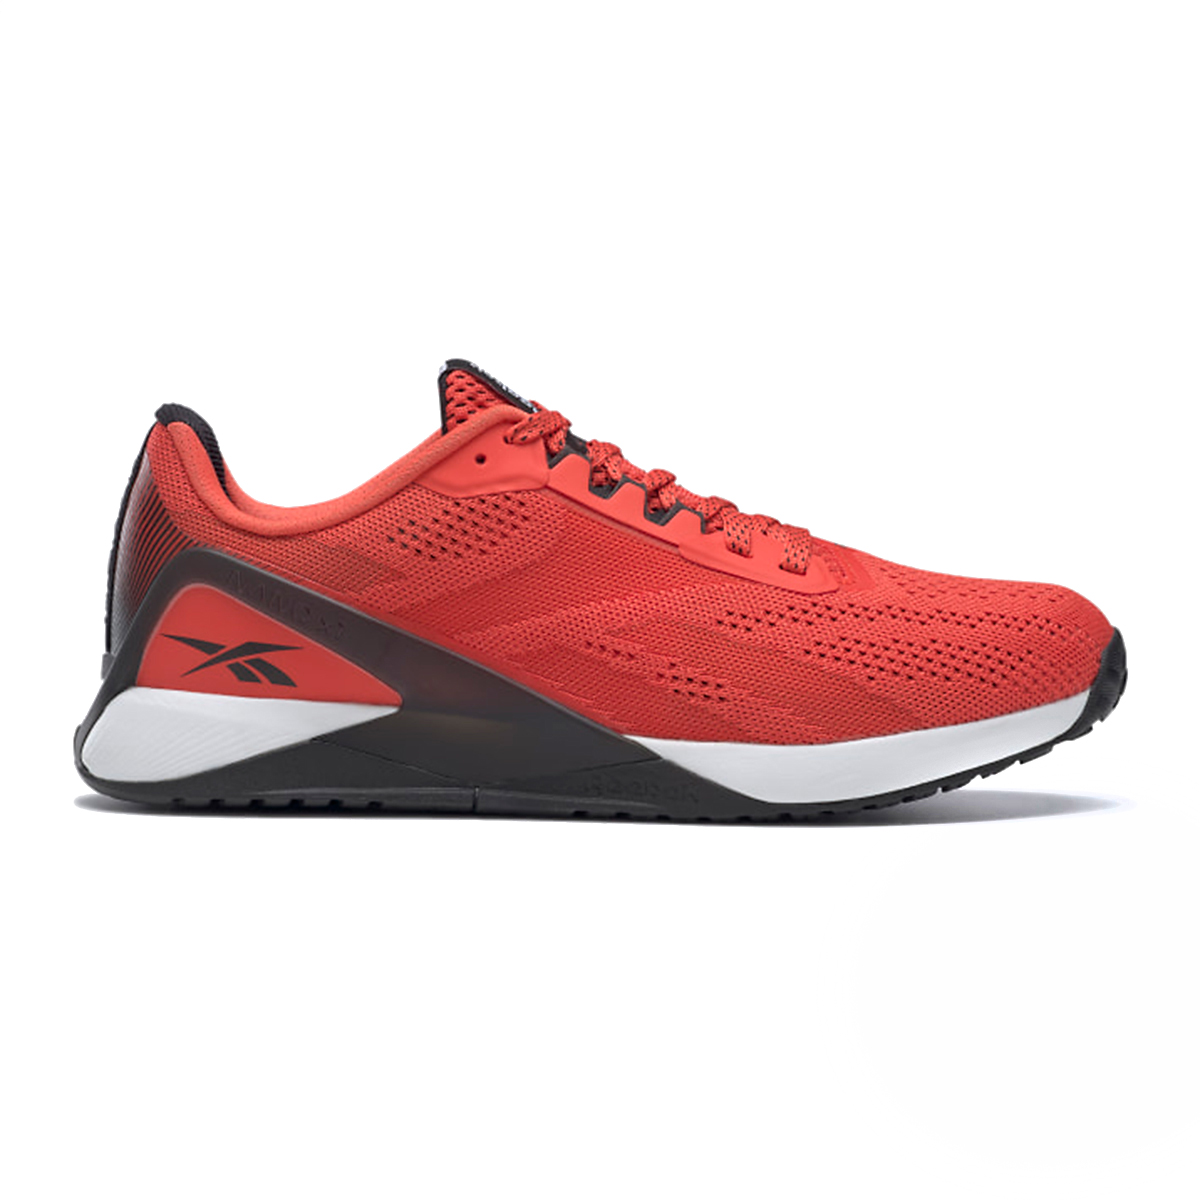 Men's Reebok Nano X1 Training Shoe - Color: Dynamic Red/White/Black - Size: 7 - Width: Regular, Dynamic Red/White/Black, large, image 1